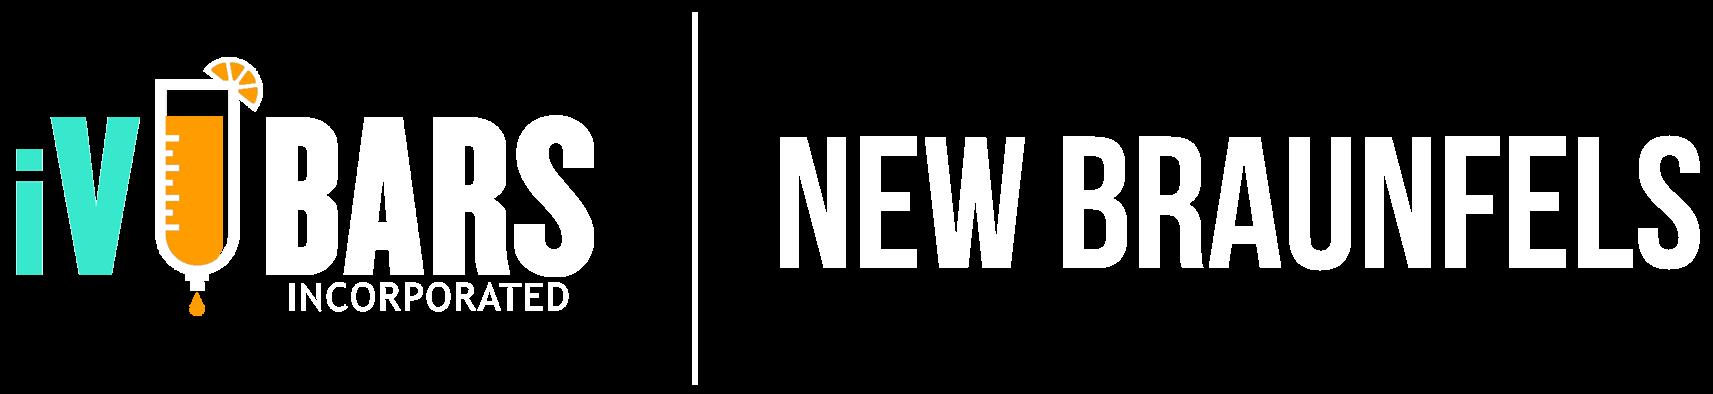 Main iV Bars New Braunfels logo white